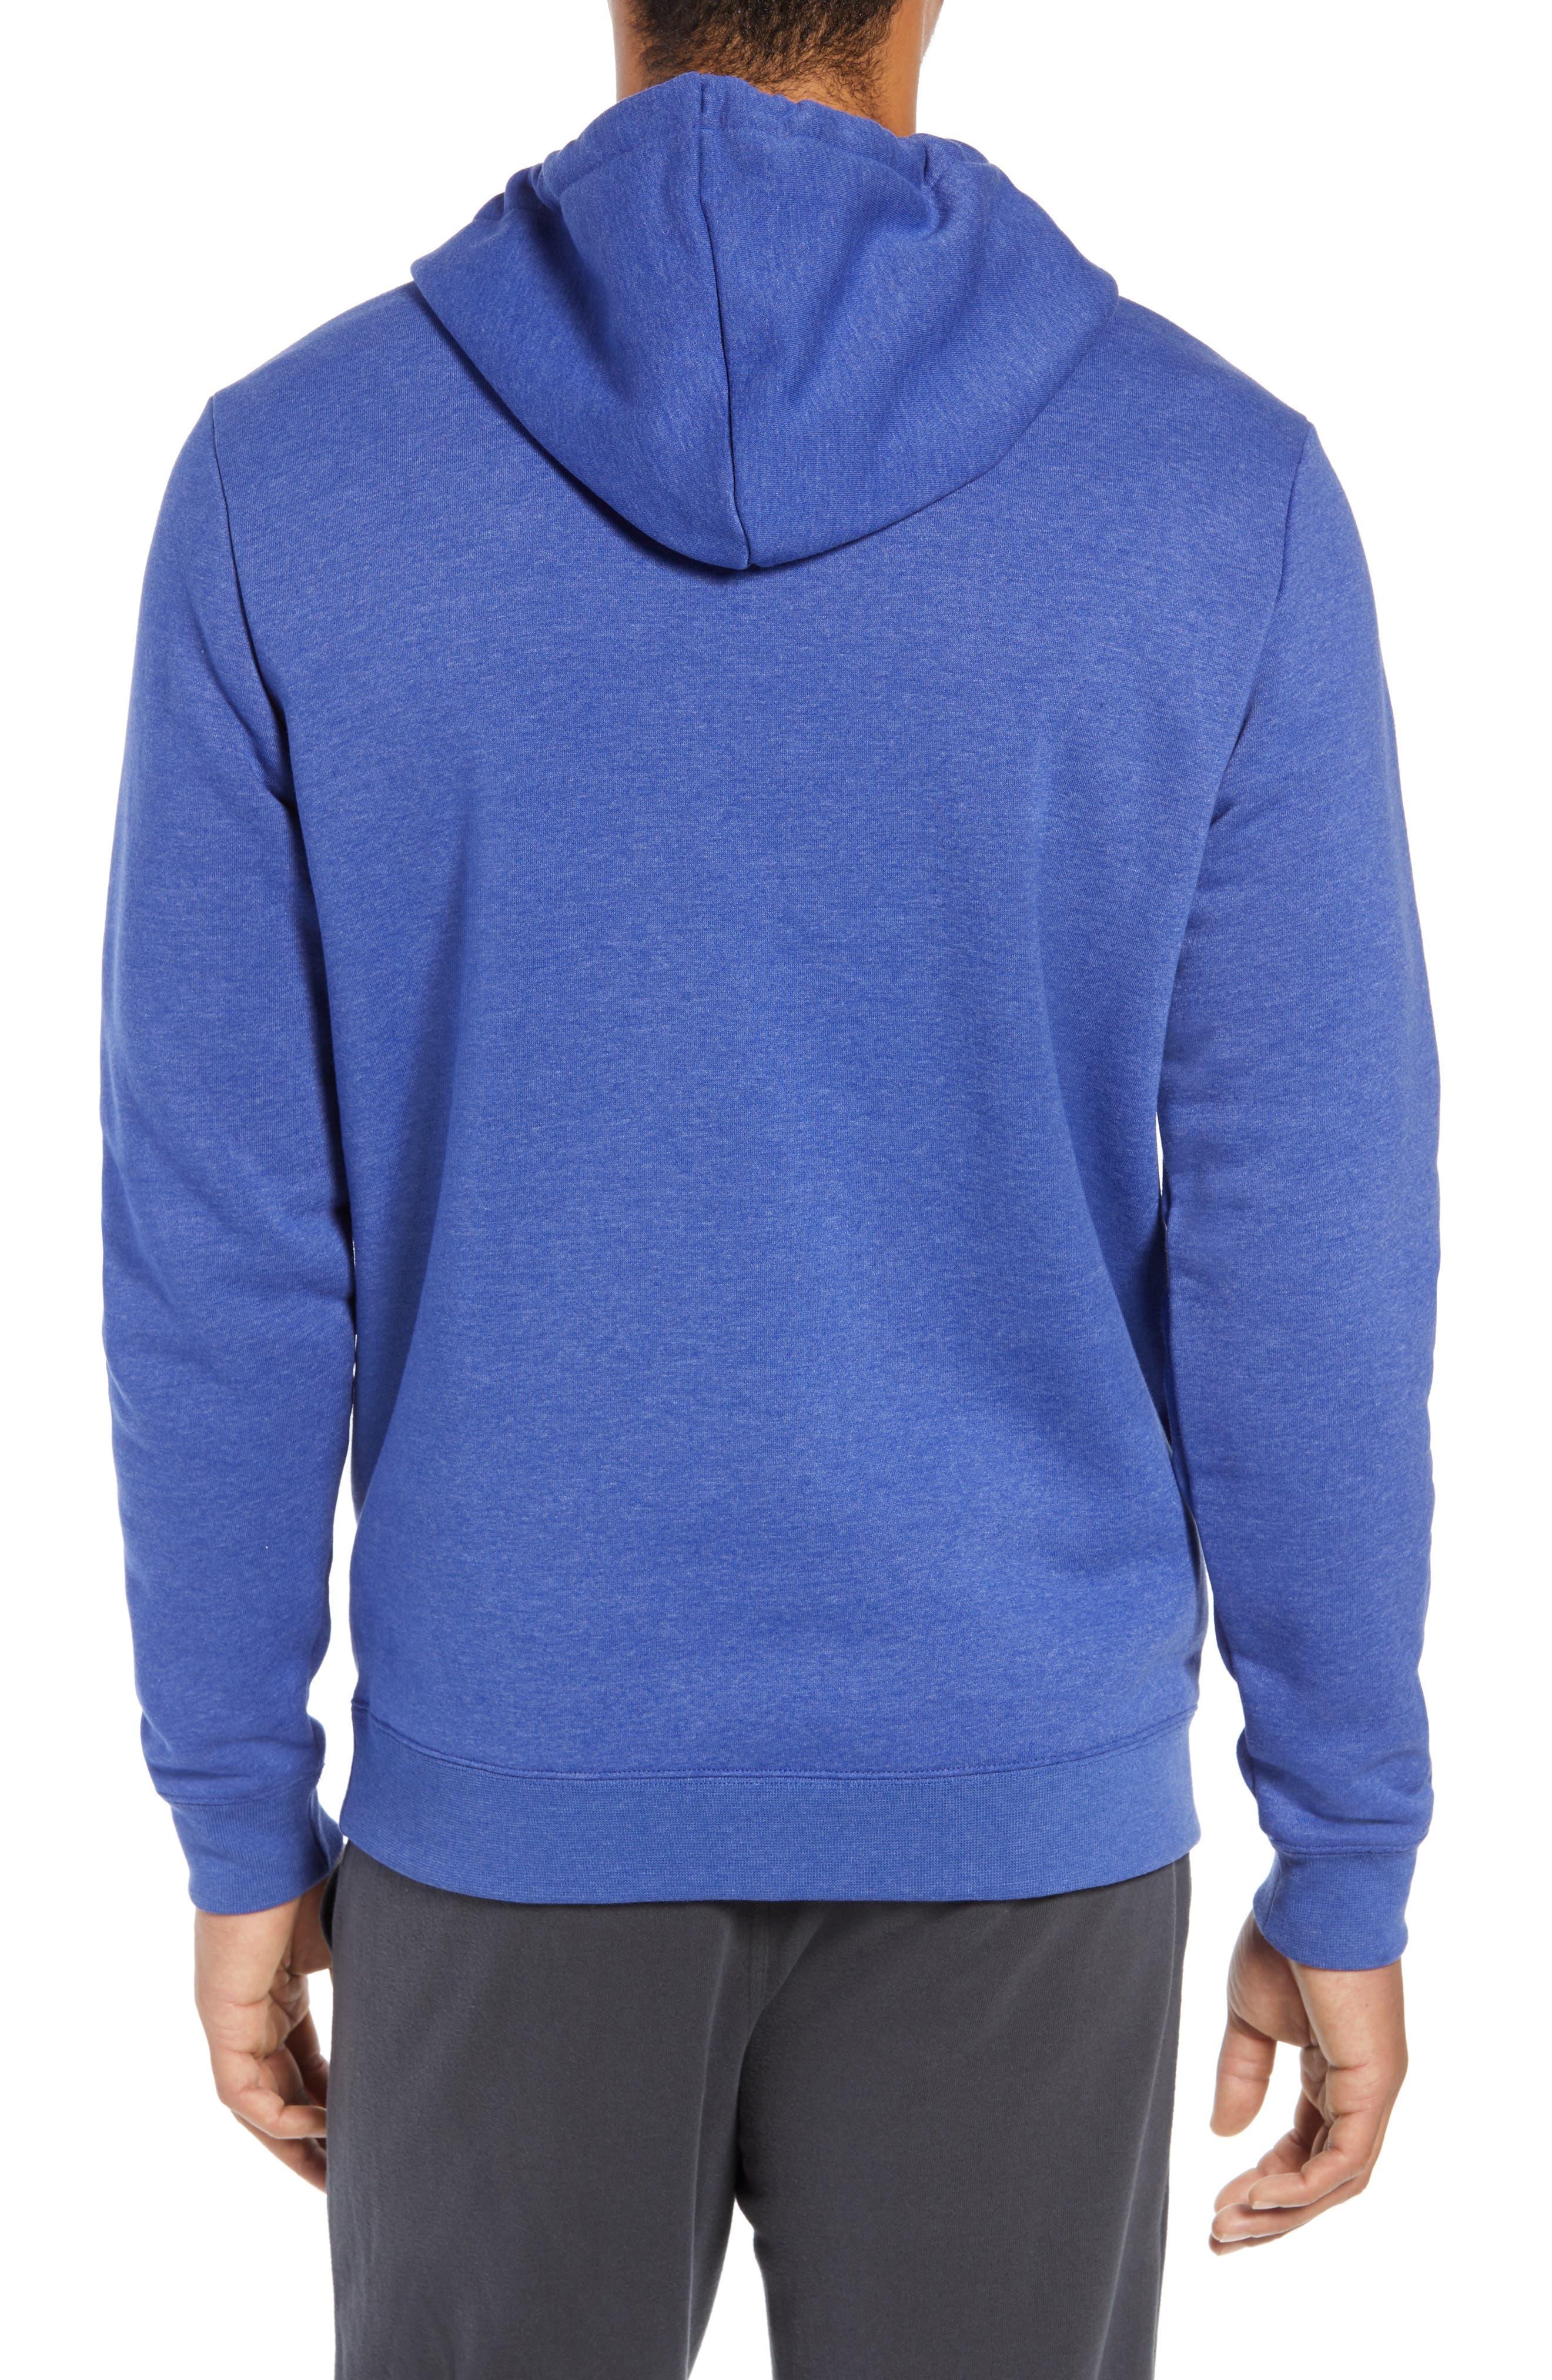 Surf Check Hoodie Sweatshirt,                             Alternate thumbnail 2, color,                             DEEP ROYAL HEATHER/ WHITE